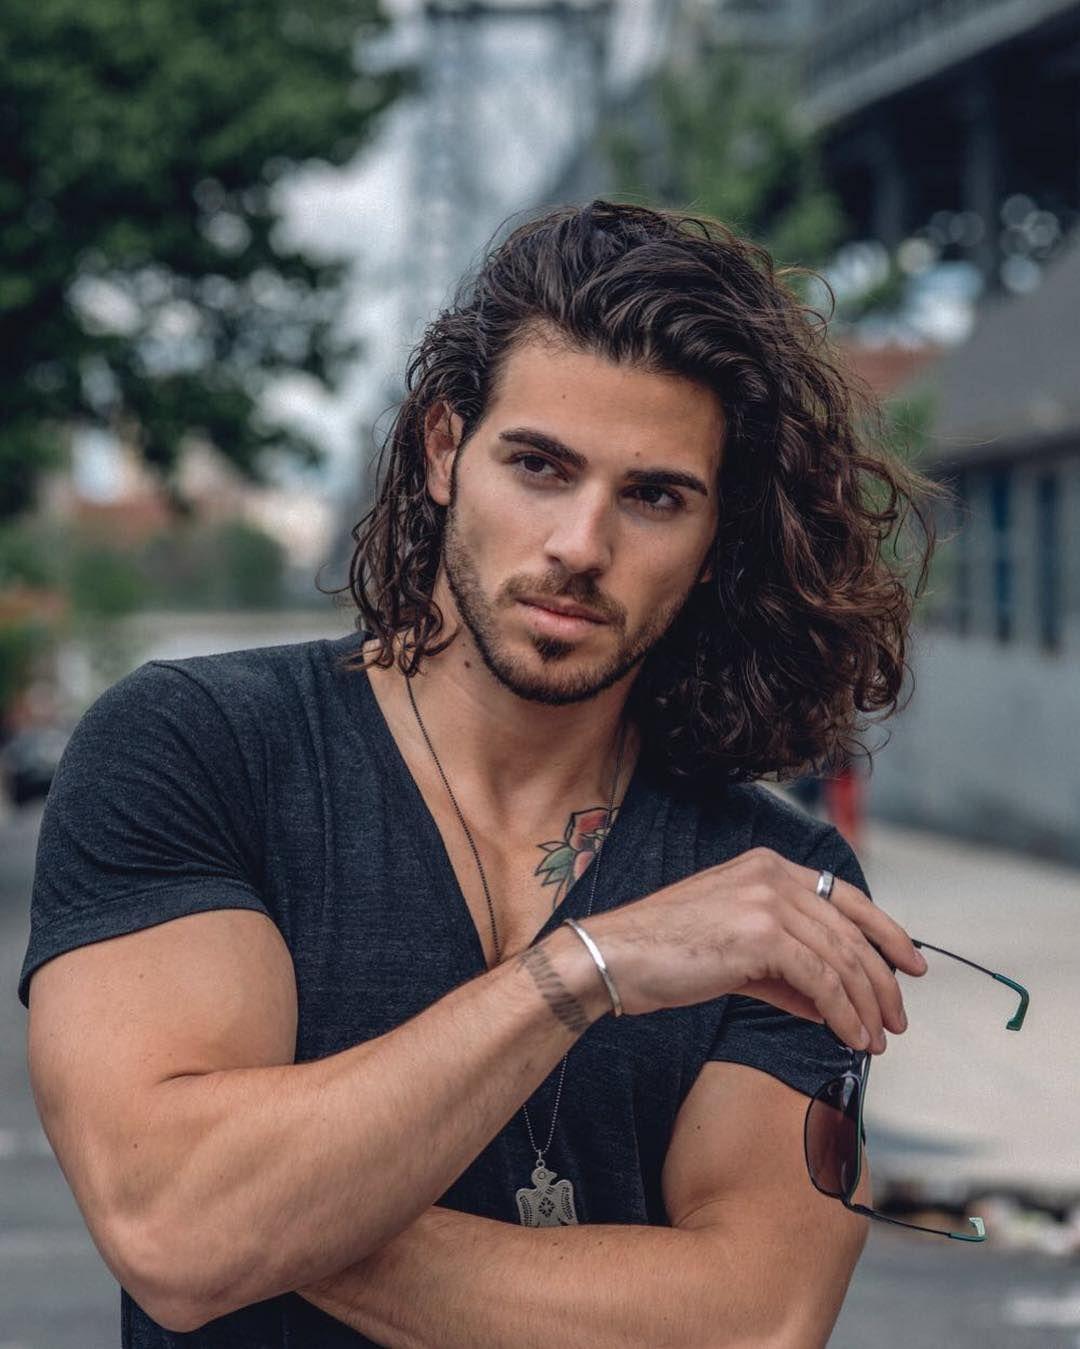 Enrico Omri Ravenna Enrico Ravenna Long Curly Hair Men With Long Hair Long Hair Inspiration Cur Guy Haircuts Long Long Hair Styles Men Wavy Hair Men